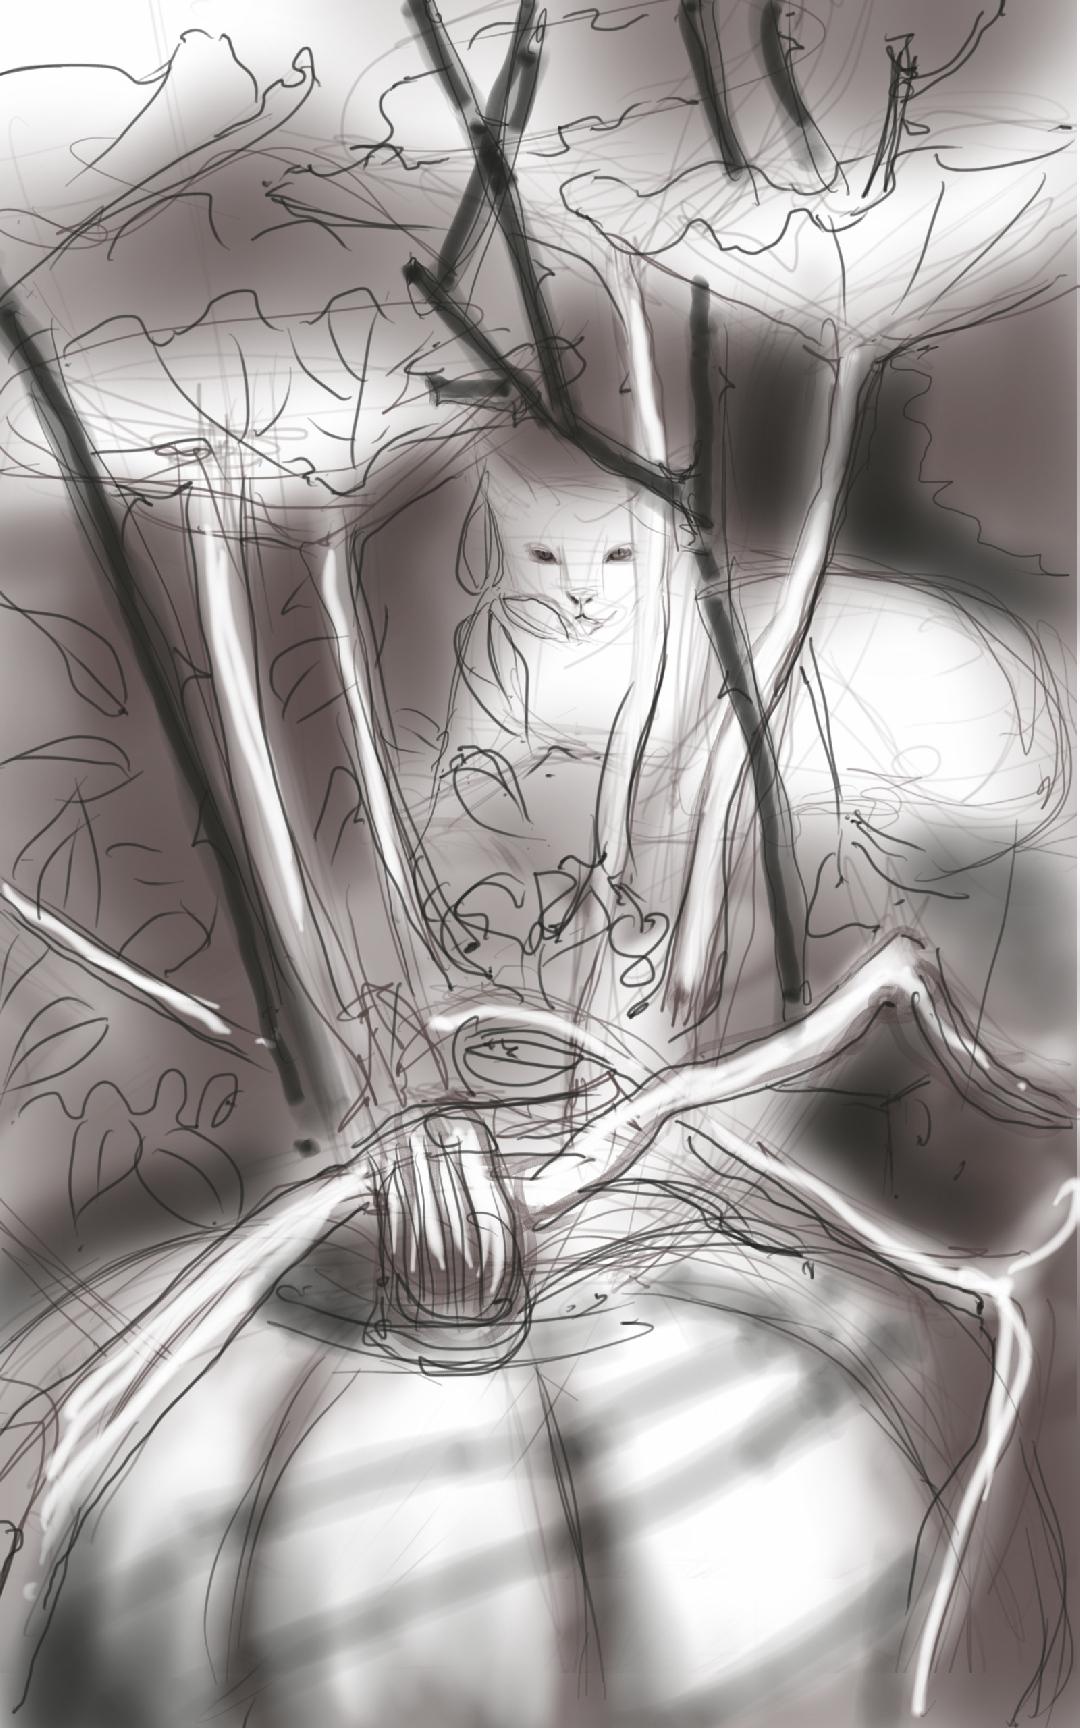 Guardian of the Pumpkin - work-in-progress